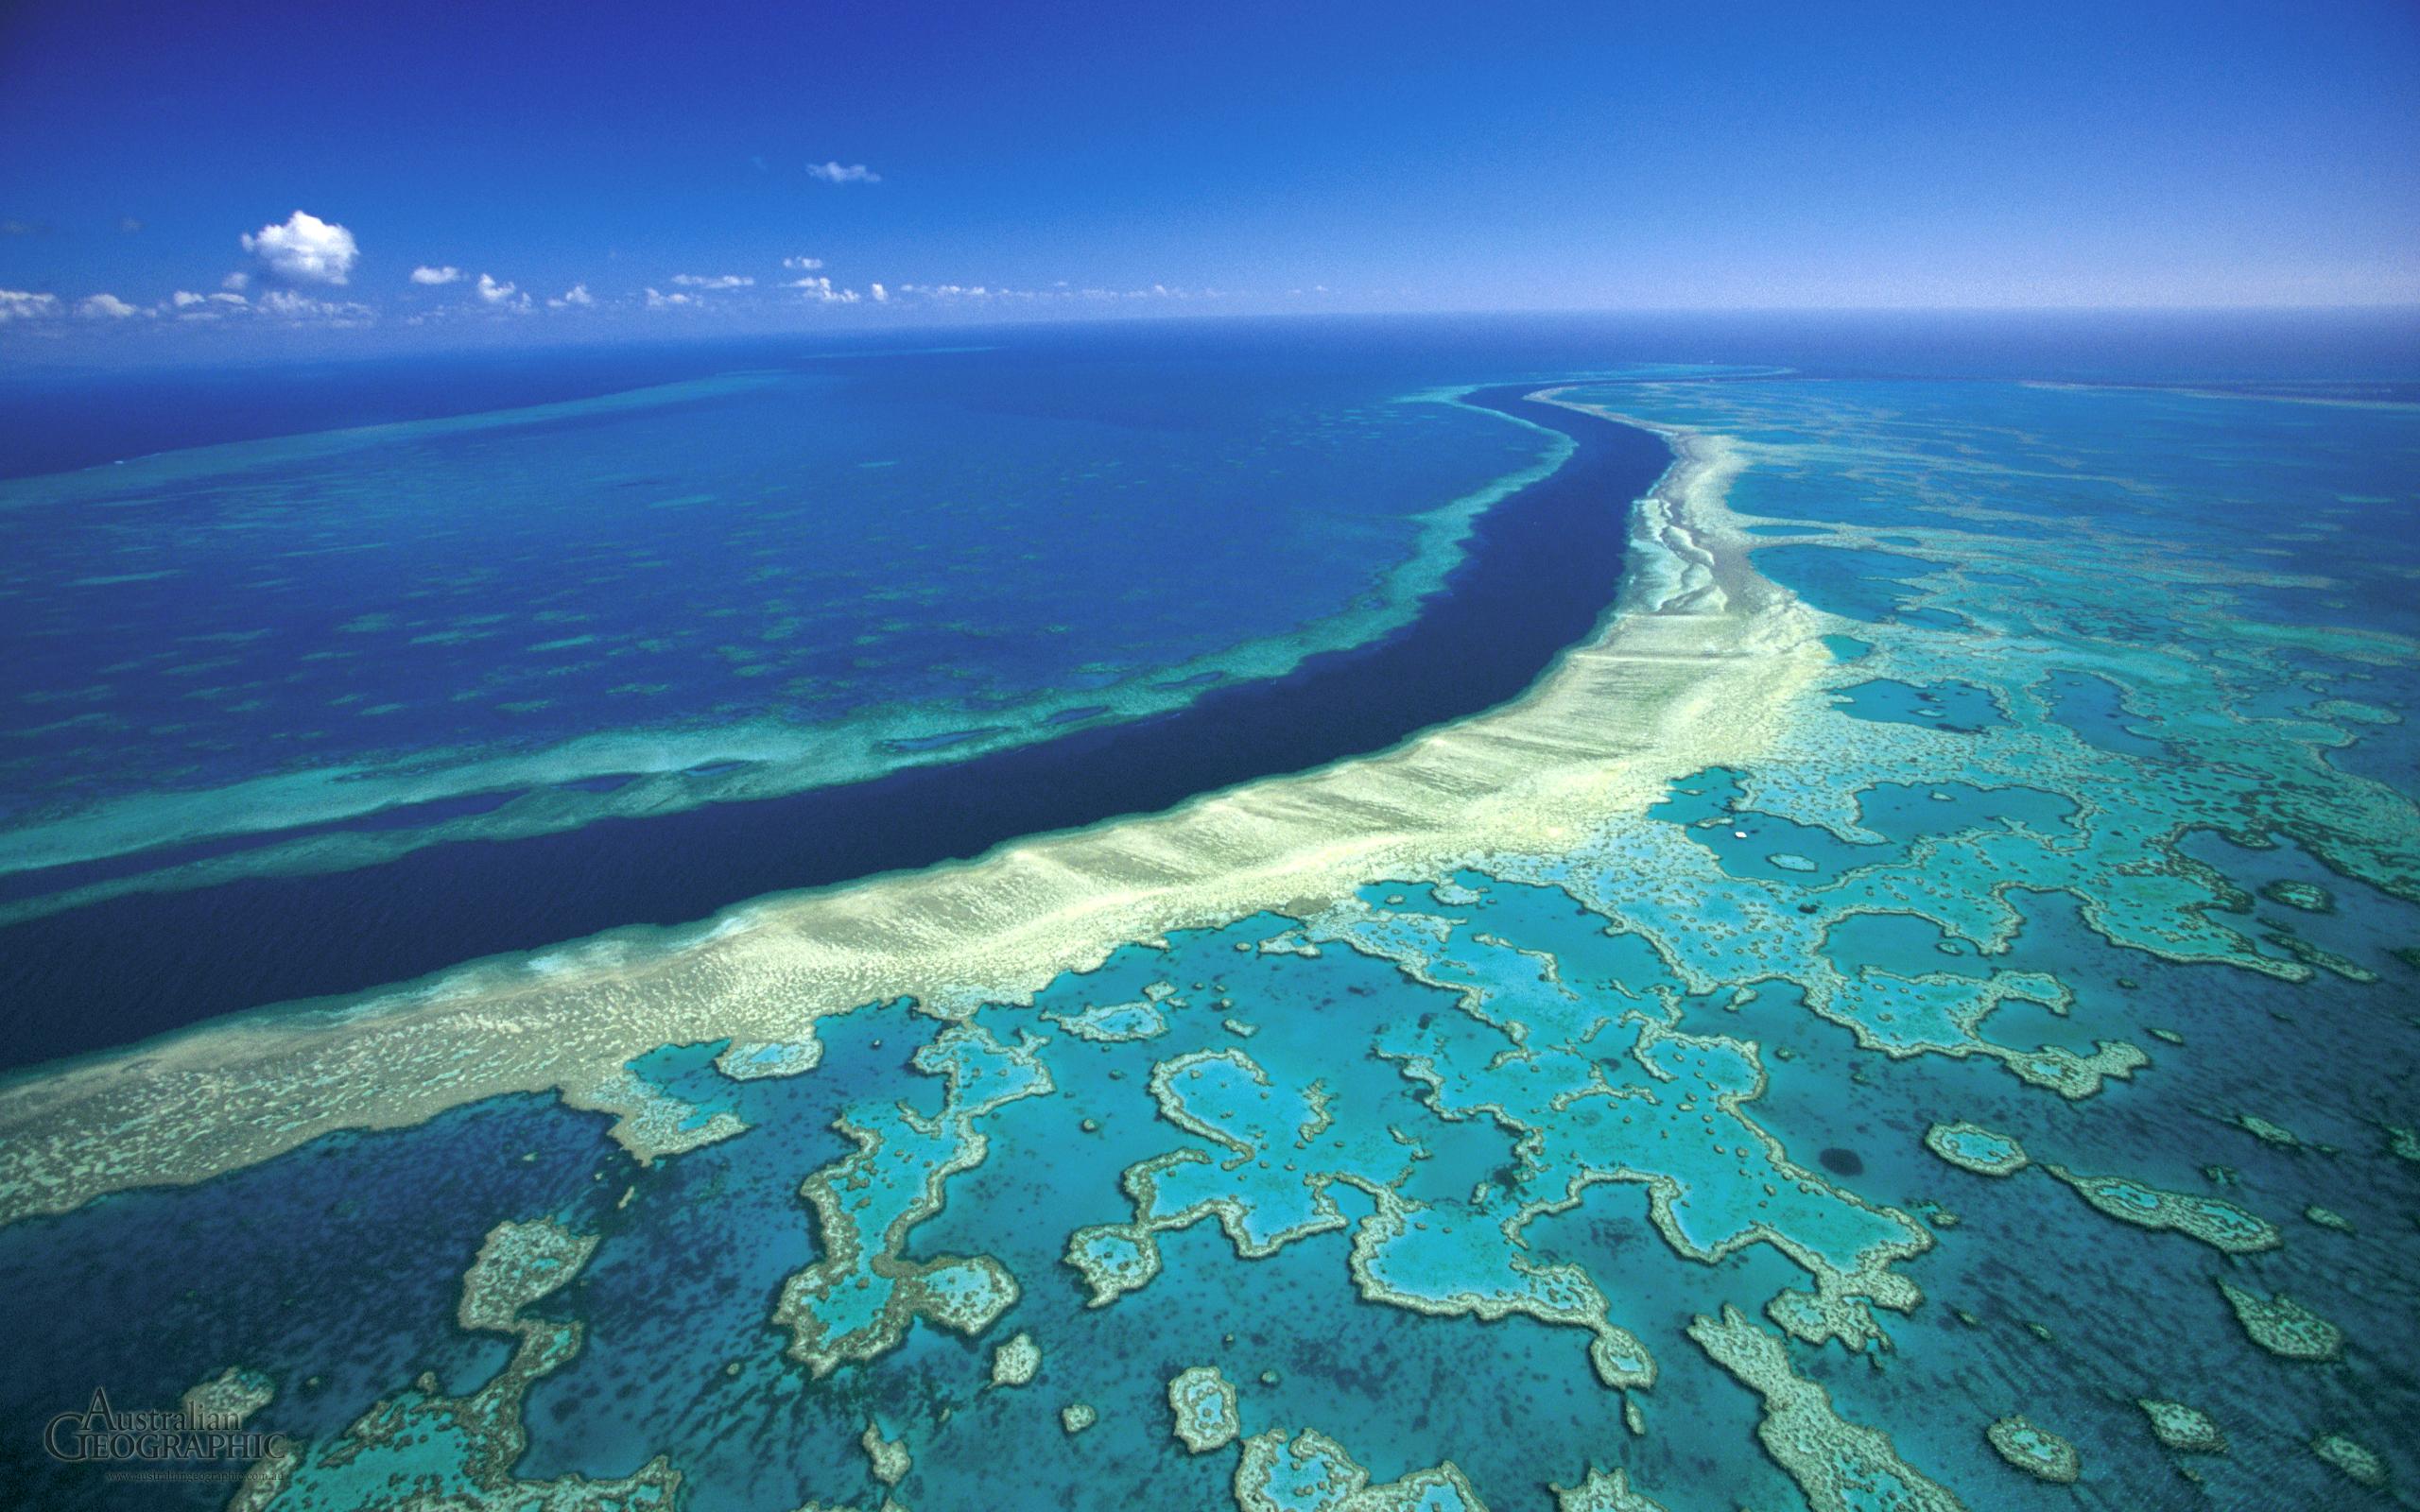 great-barrier-reef-aerial-view-from-top.jpg